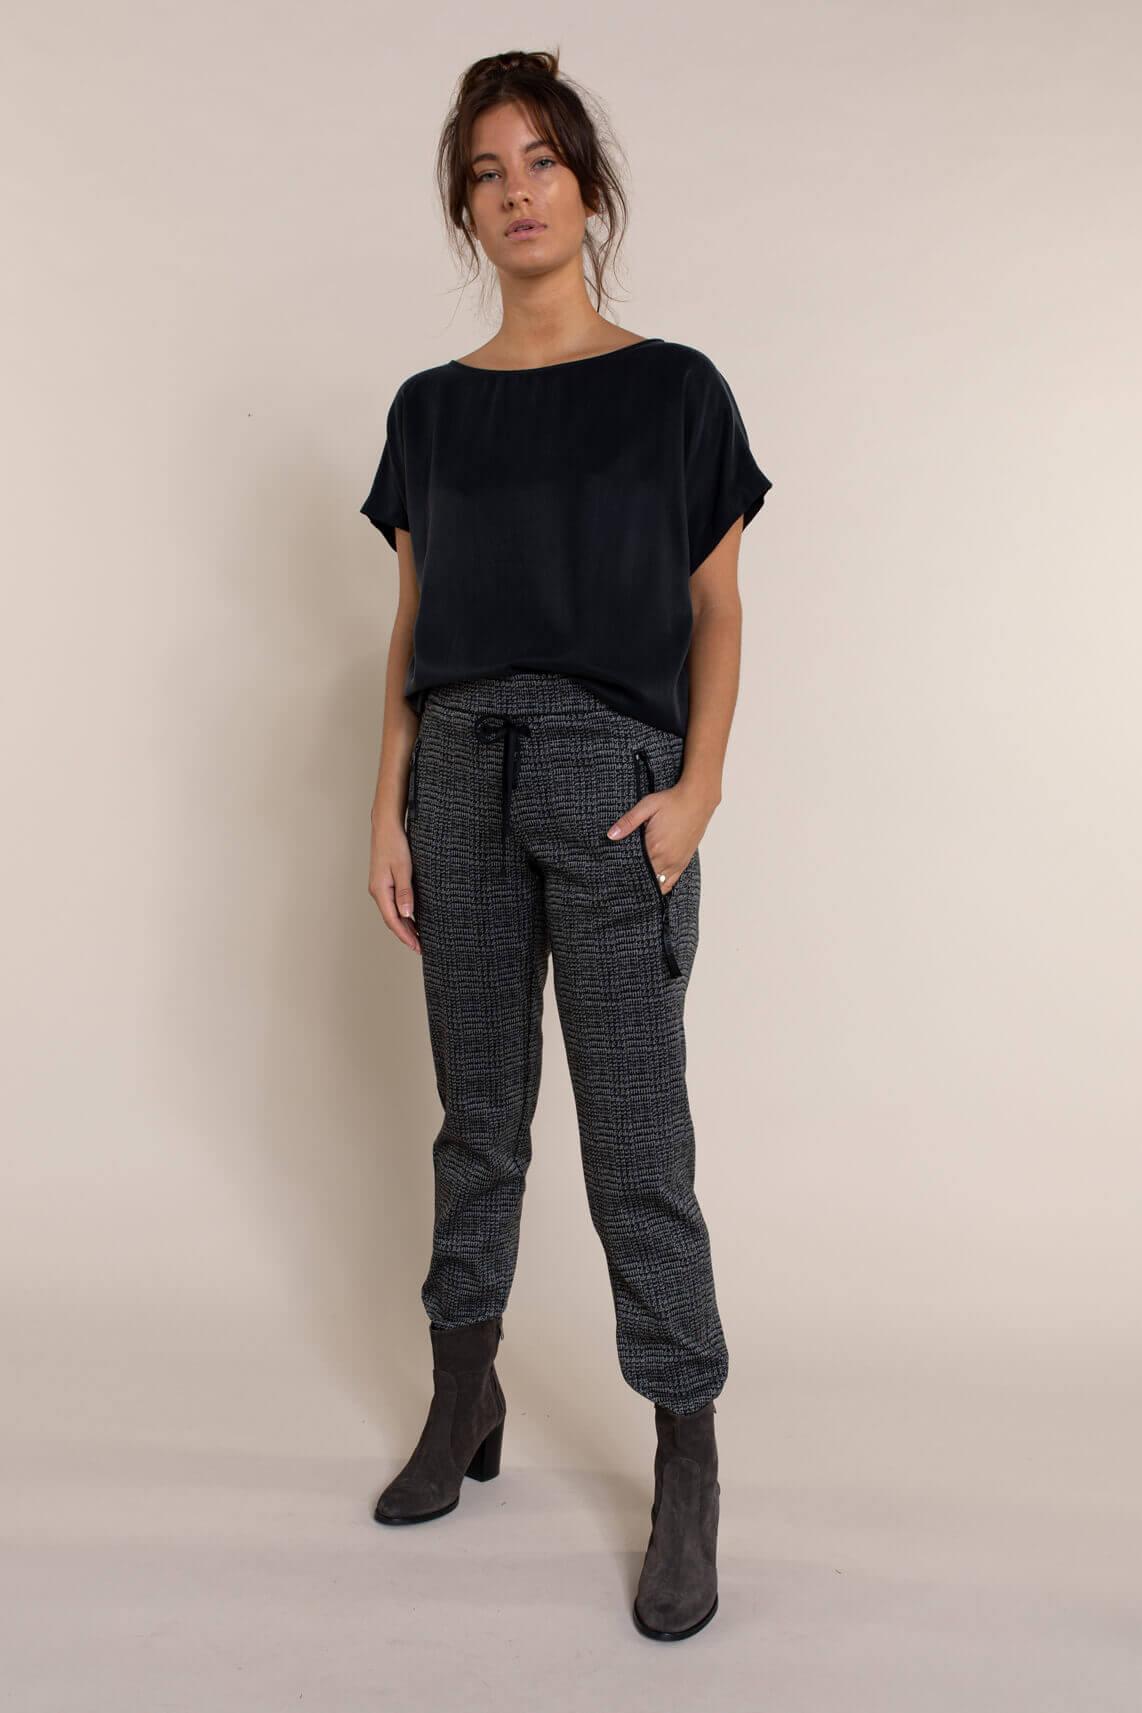 Cambio Dames Jessy jogpantalon zwart